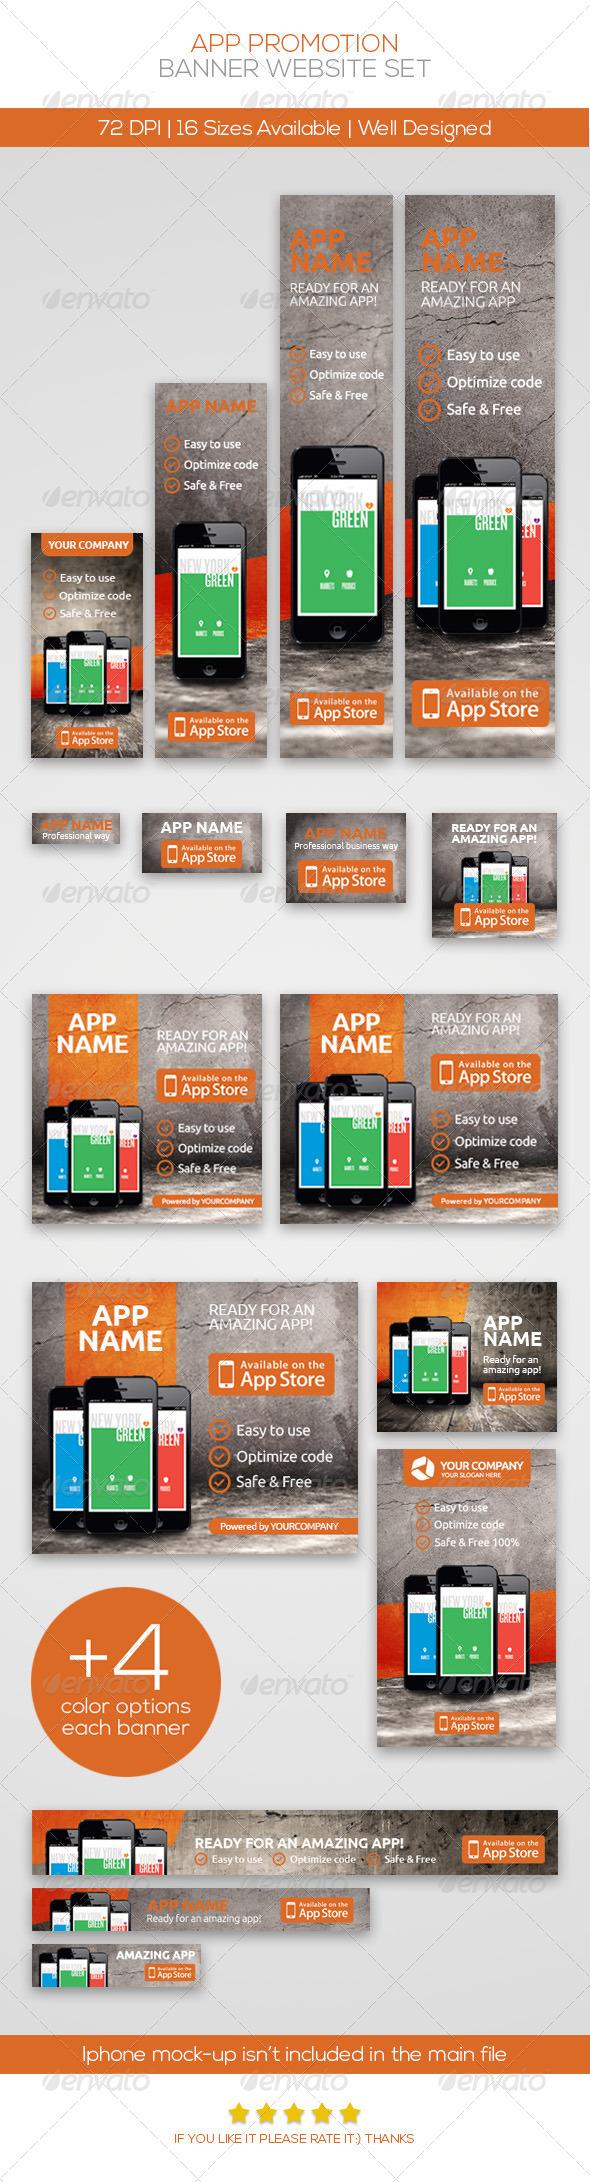 App Promotion Web Banner Set - Banners & Ads Web Elements